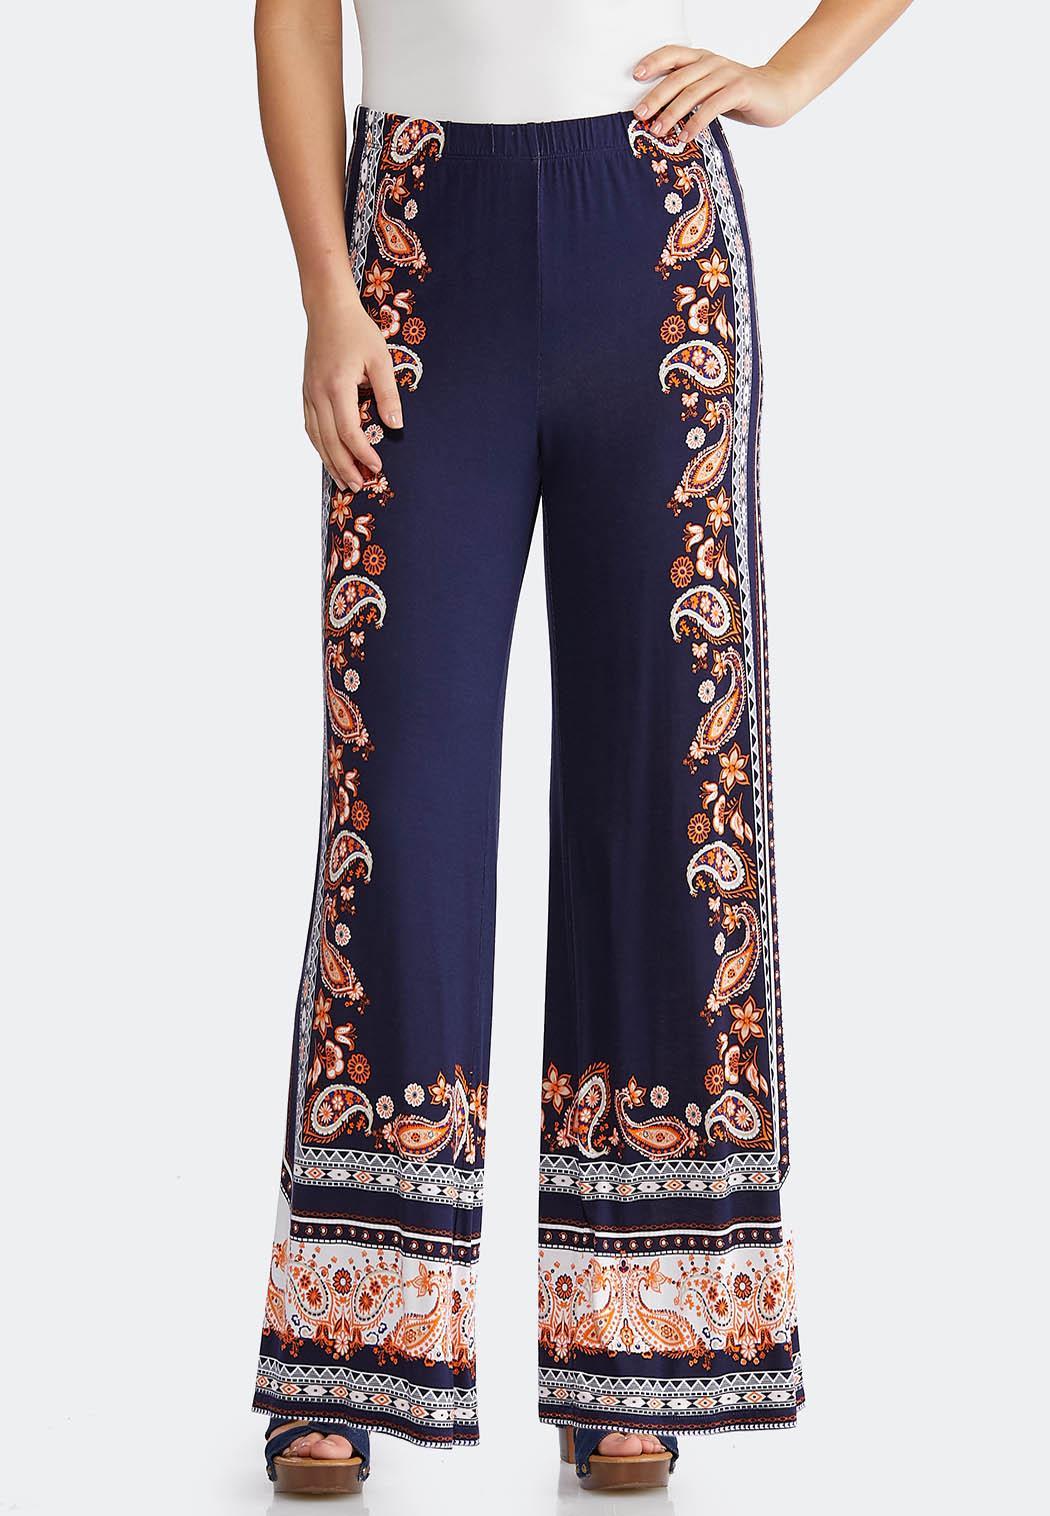 6ee6d41ba27 Petite Paisley Border Print Palazzo Pants Petite Pants Cato Fashions